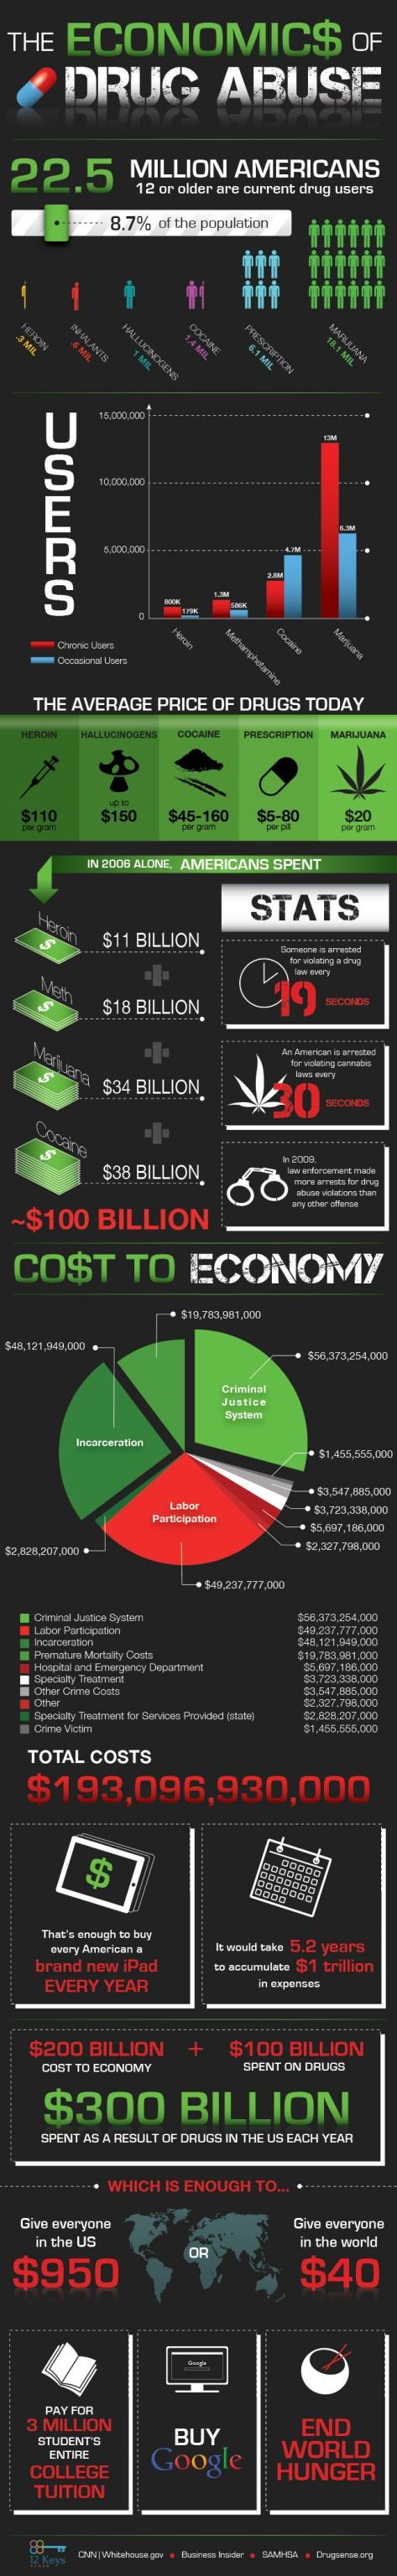 the-economics-of-drug-abuse-infographic